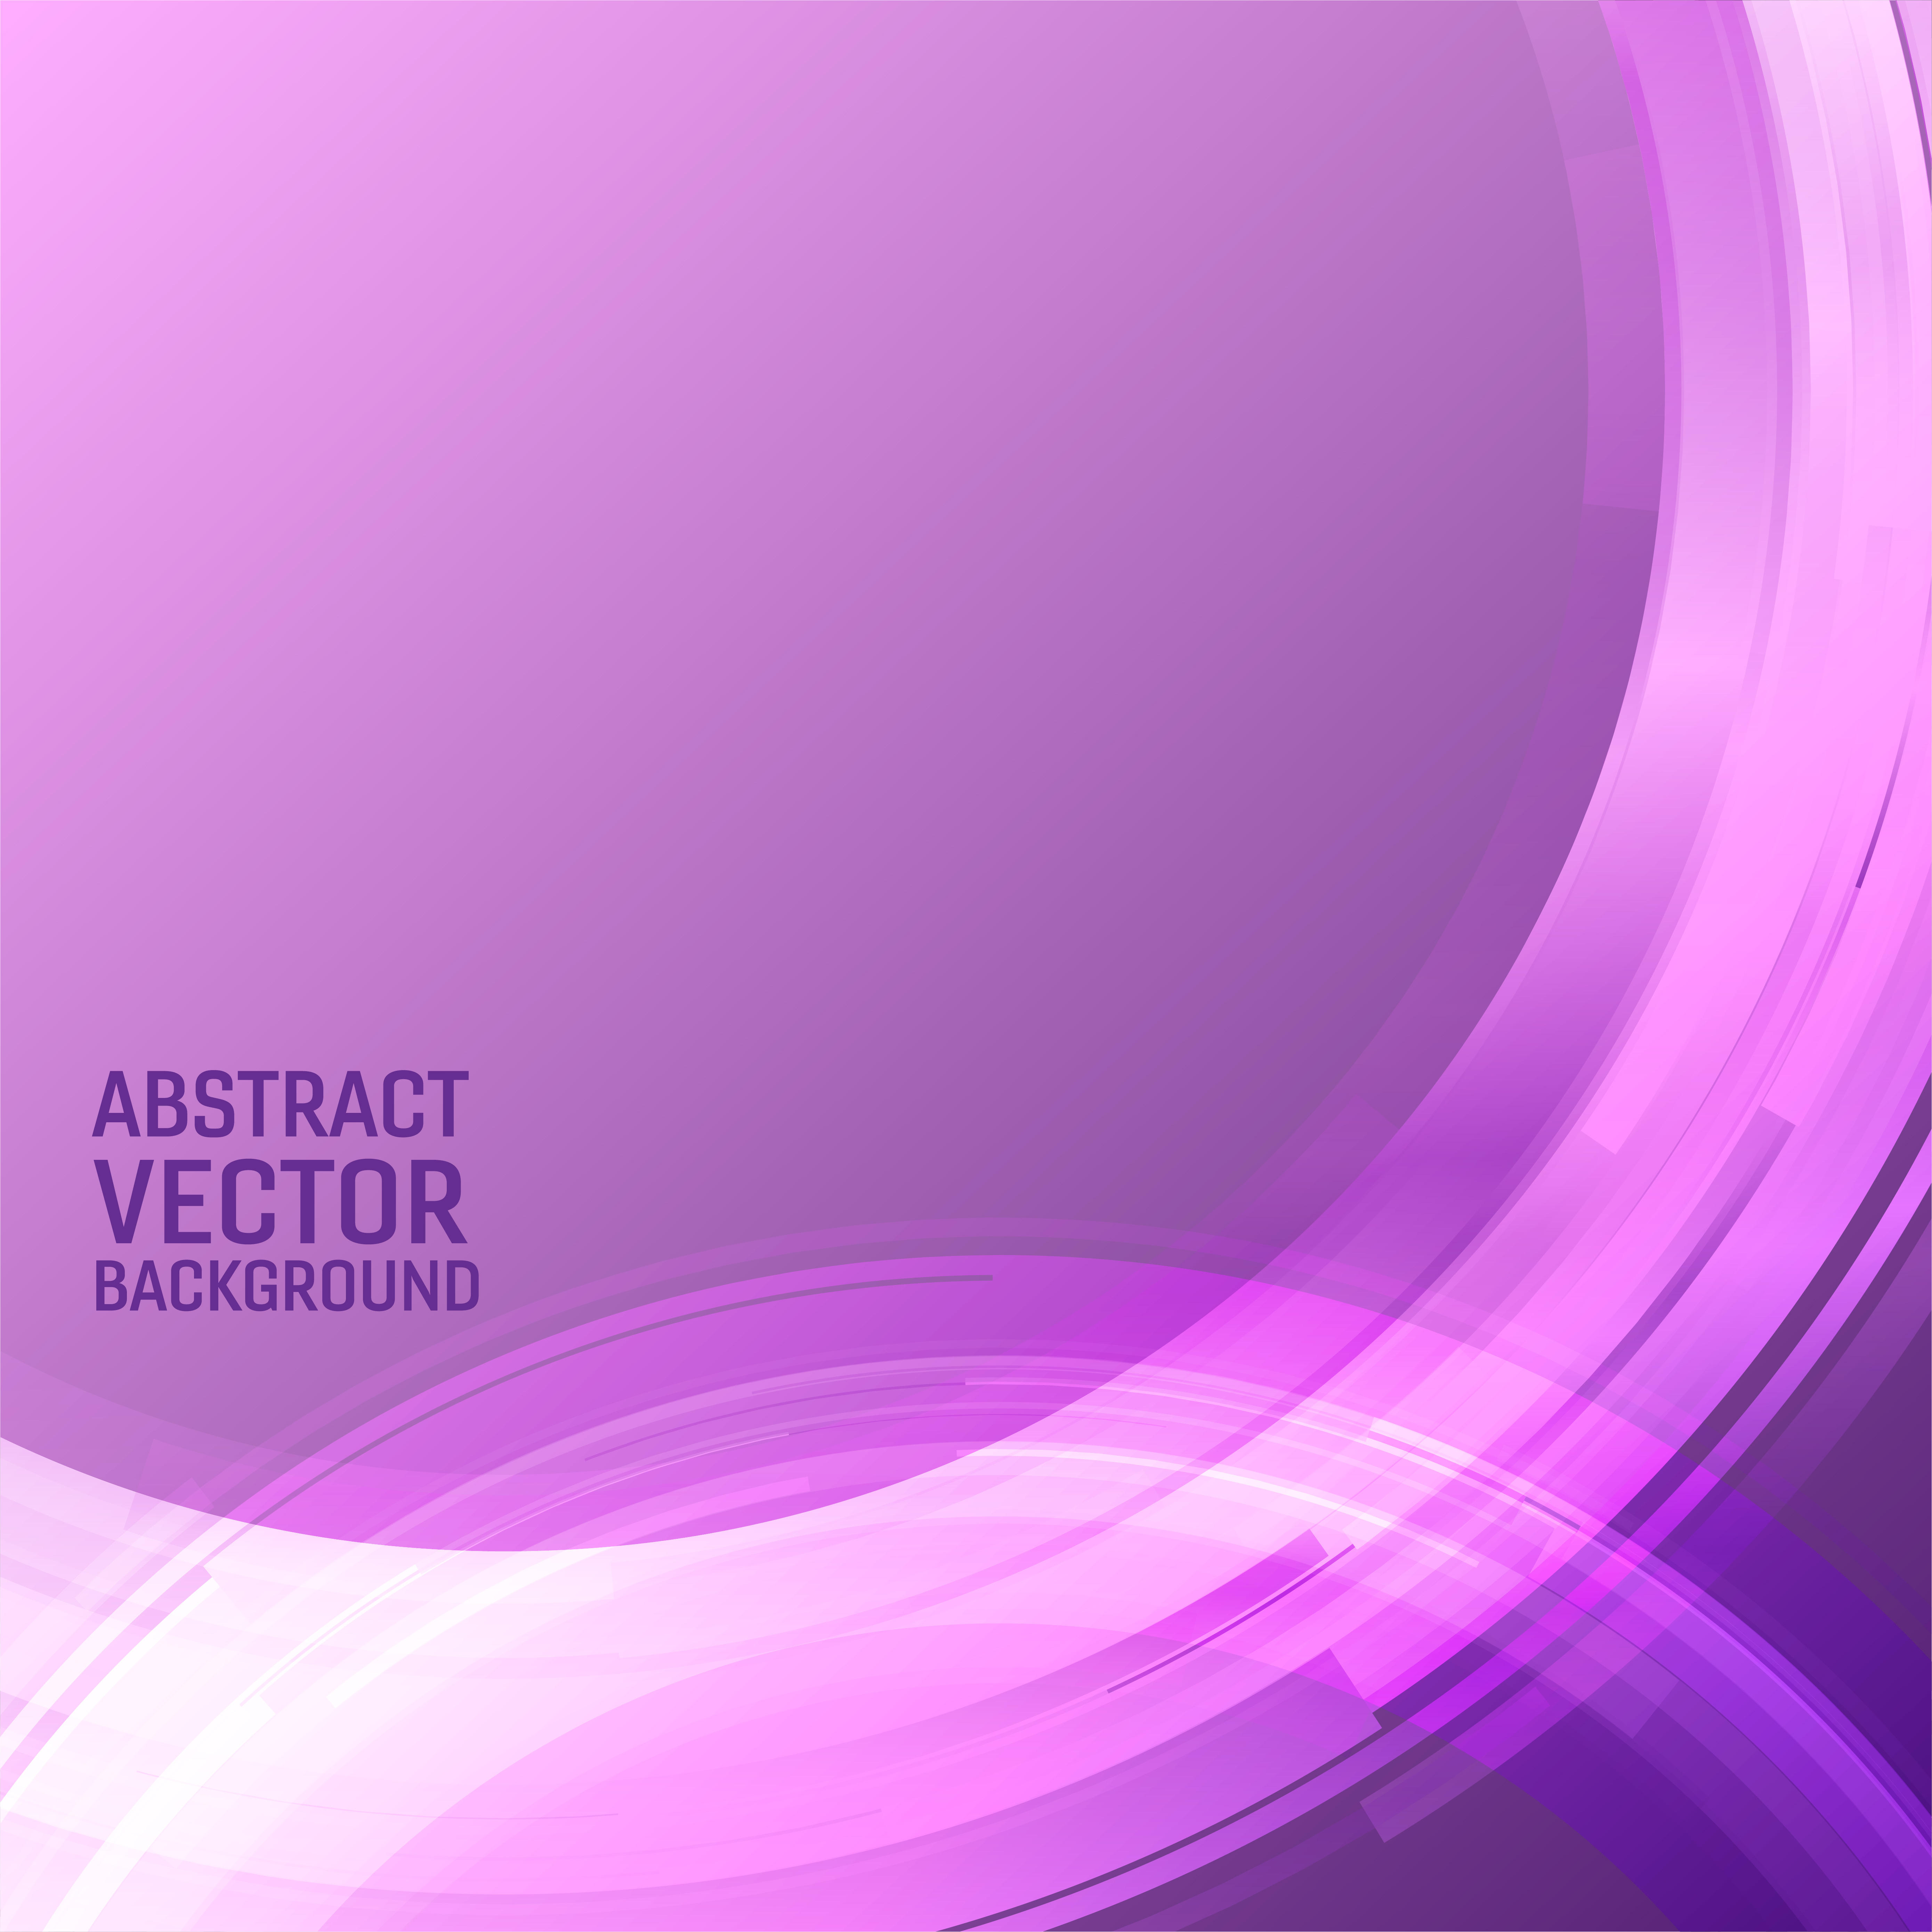 Vector Geometric Light Purple Color Illustration Graphic